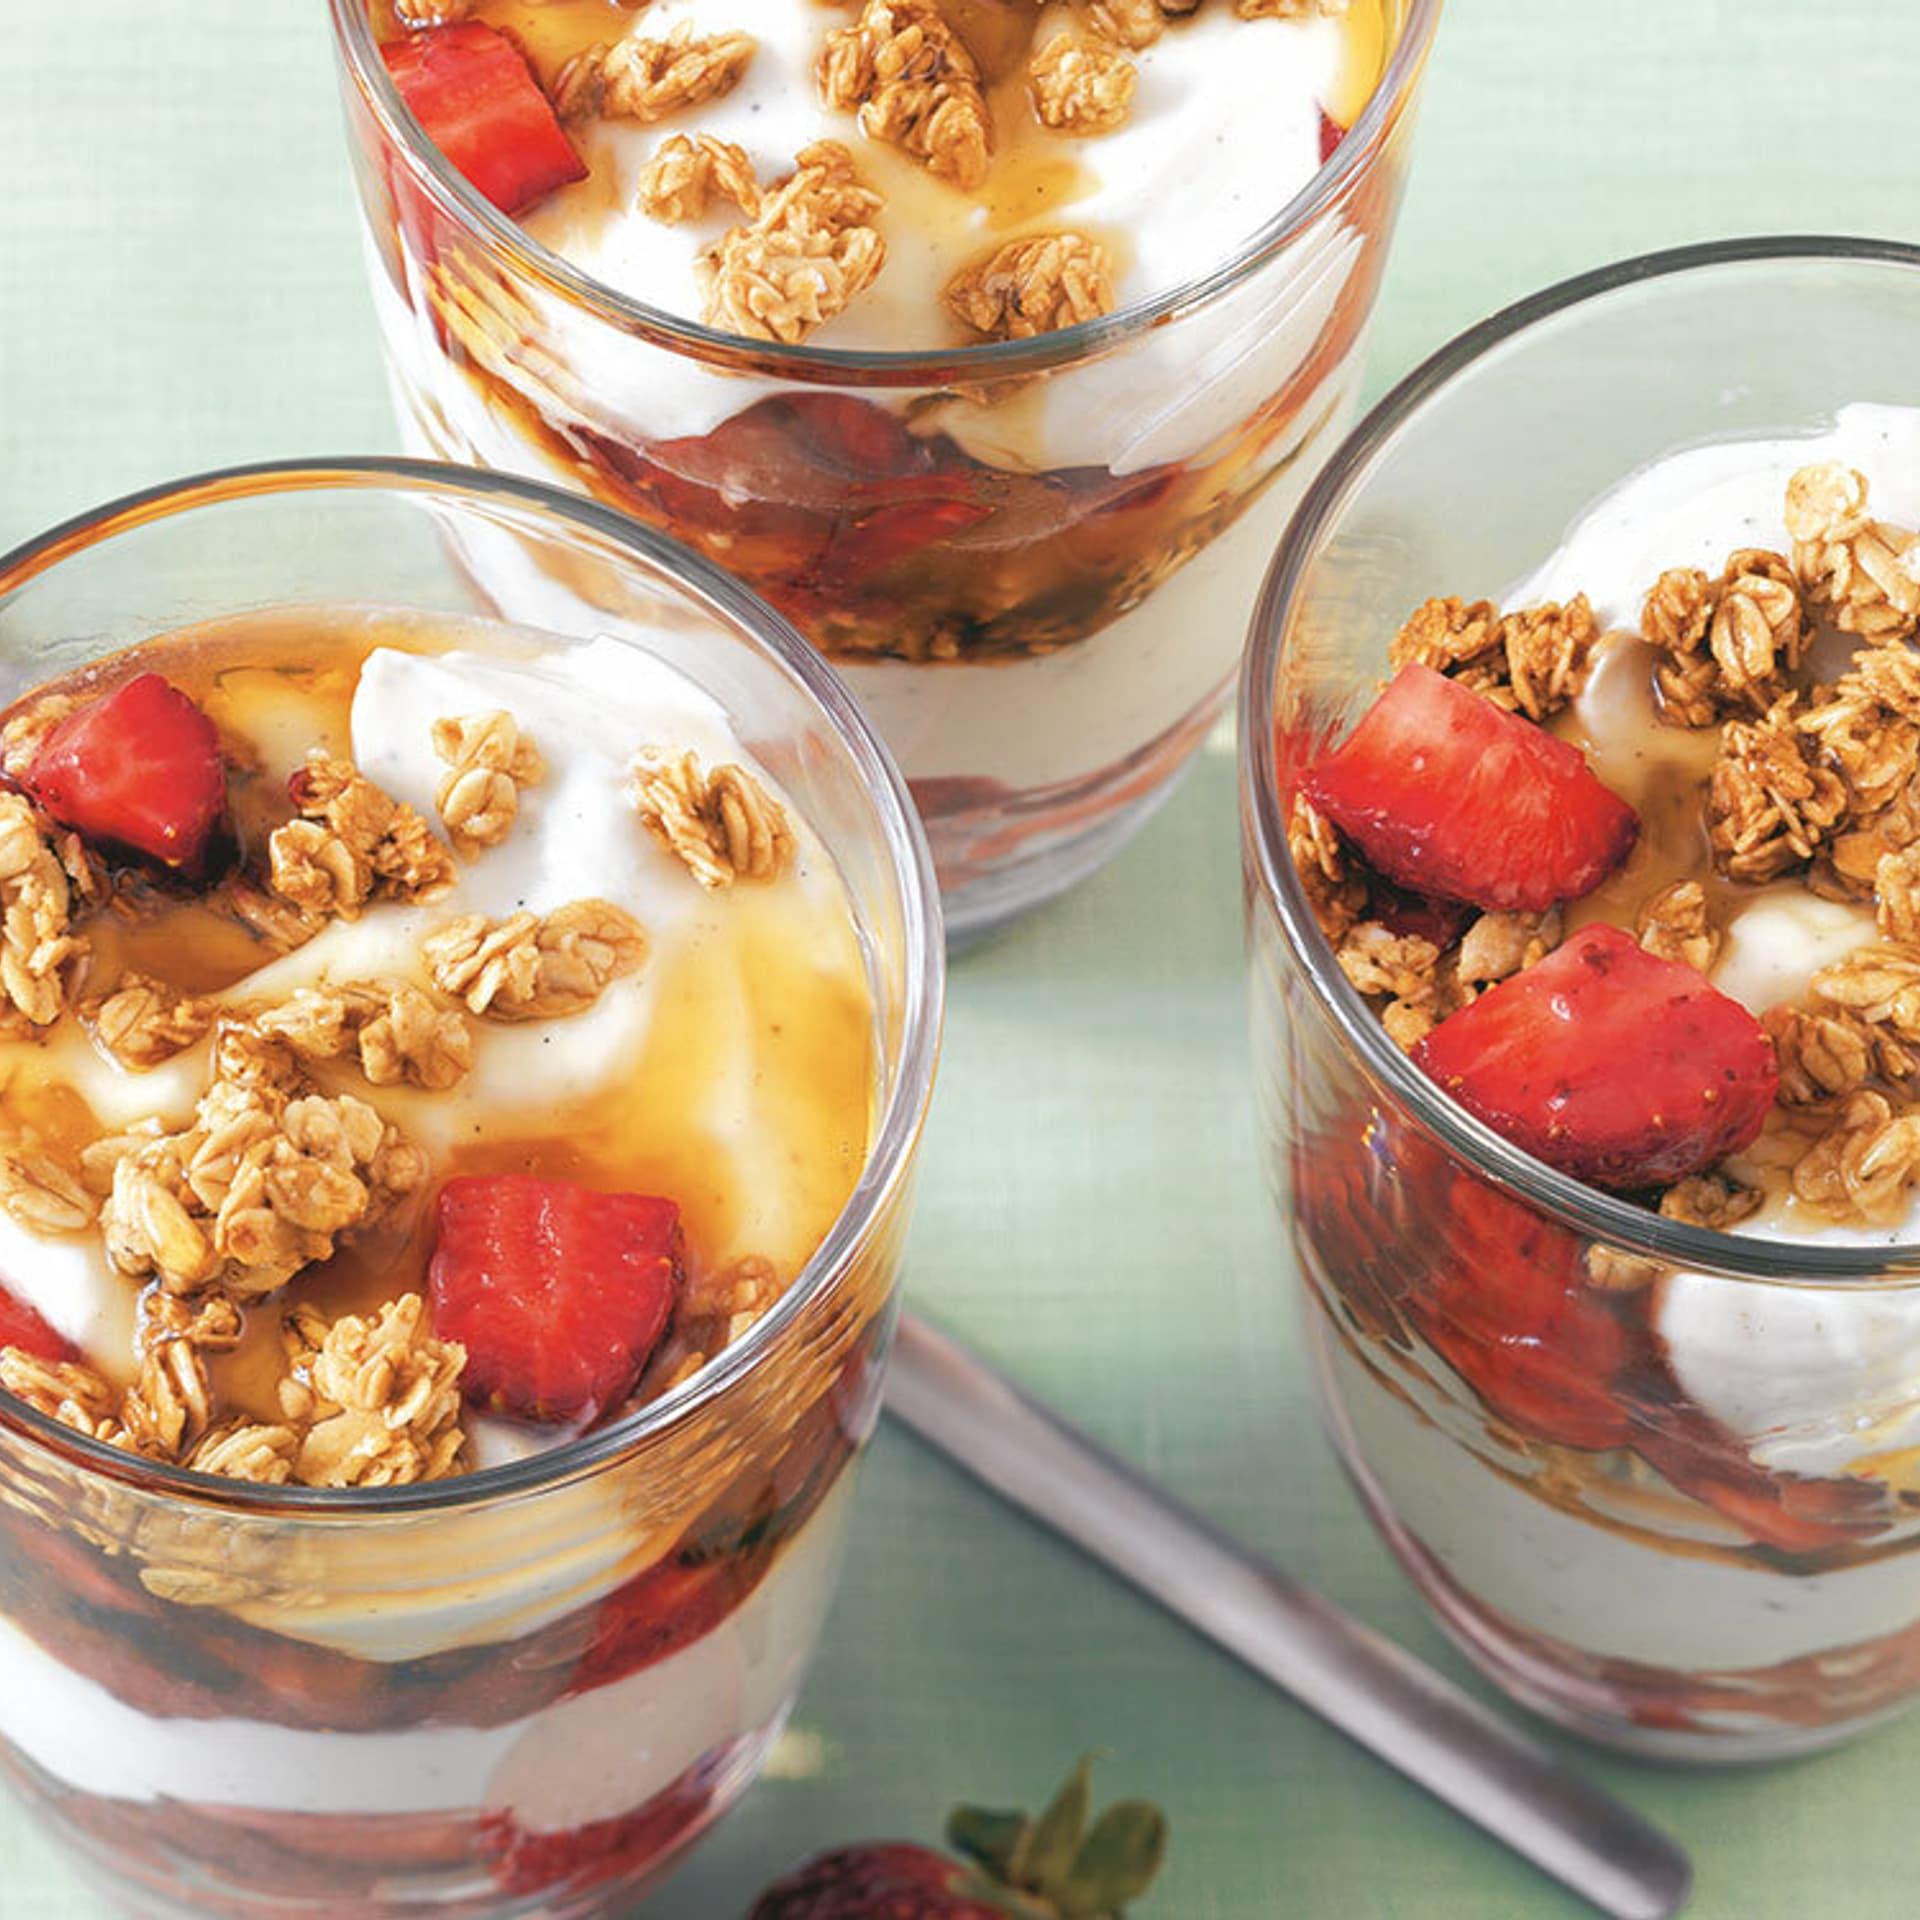 Erdbeer-Mascarpone-Trifle